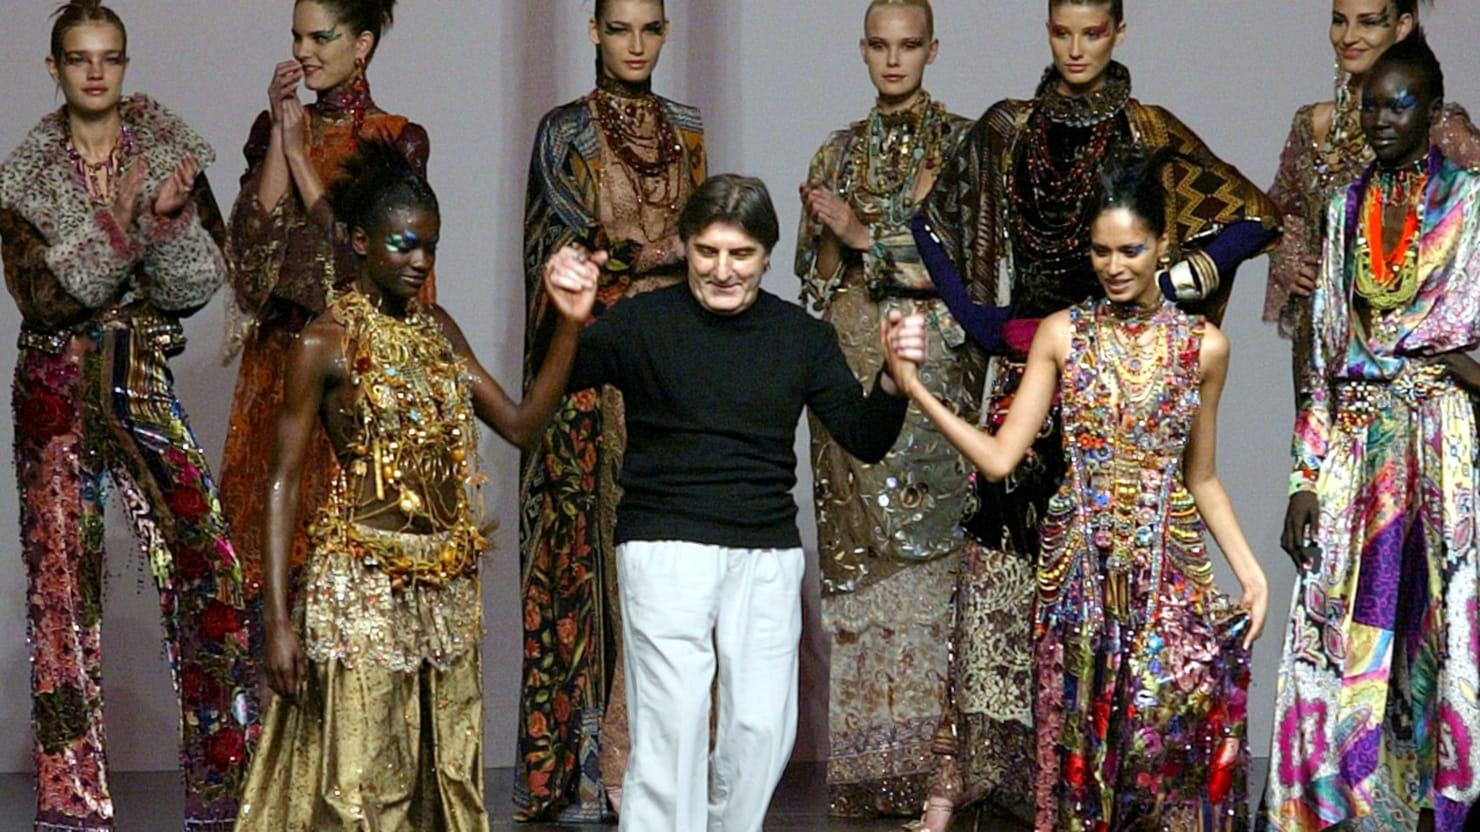 French Fashion Designer Emanuel Ungaro Dead At 86